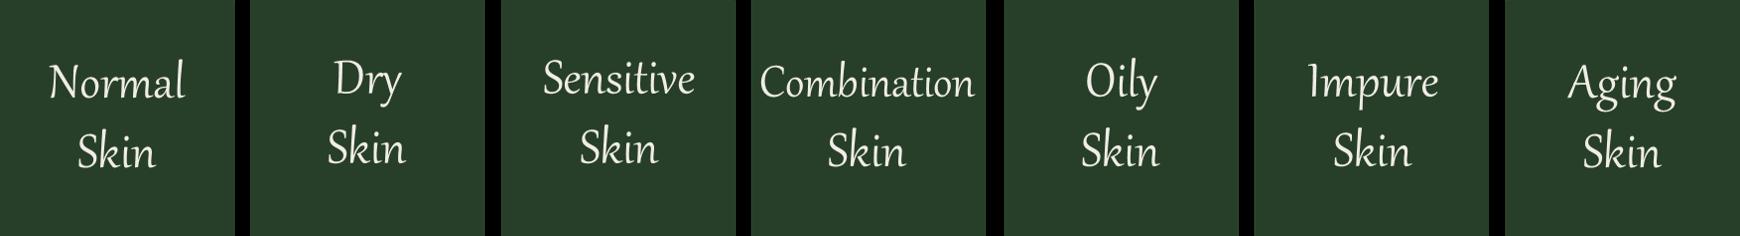 List of skin types: normal skin, dry skin, sensitive skin, combination skin, oily skin, impure skin, aging skin